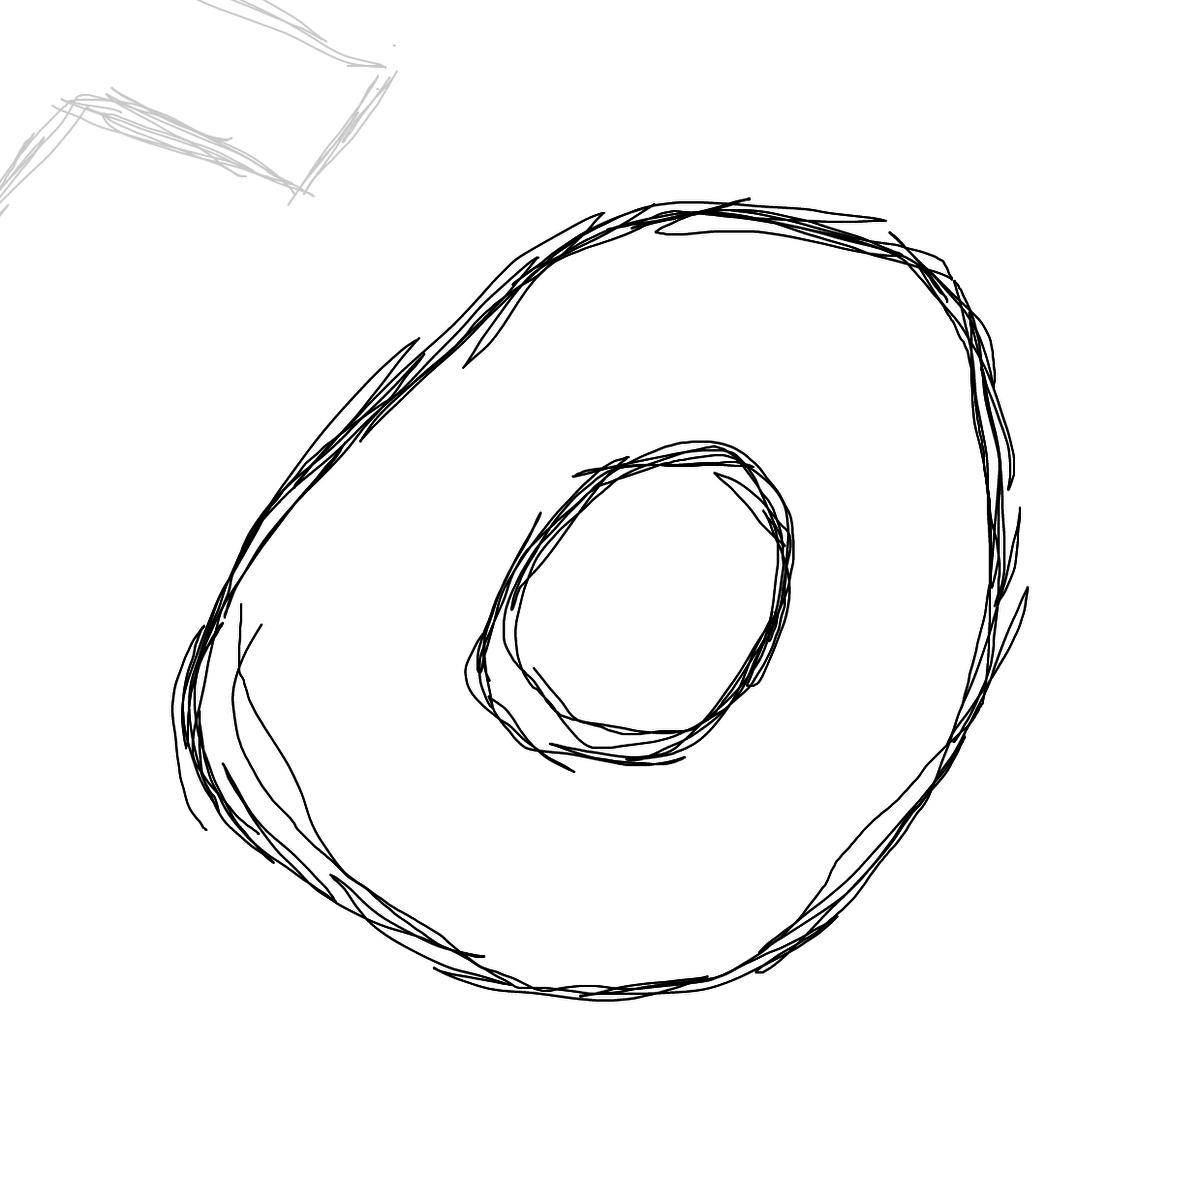 BAAAM drawing#18261 lat:-23.5658512115478500lng: -46.6512107849121100